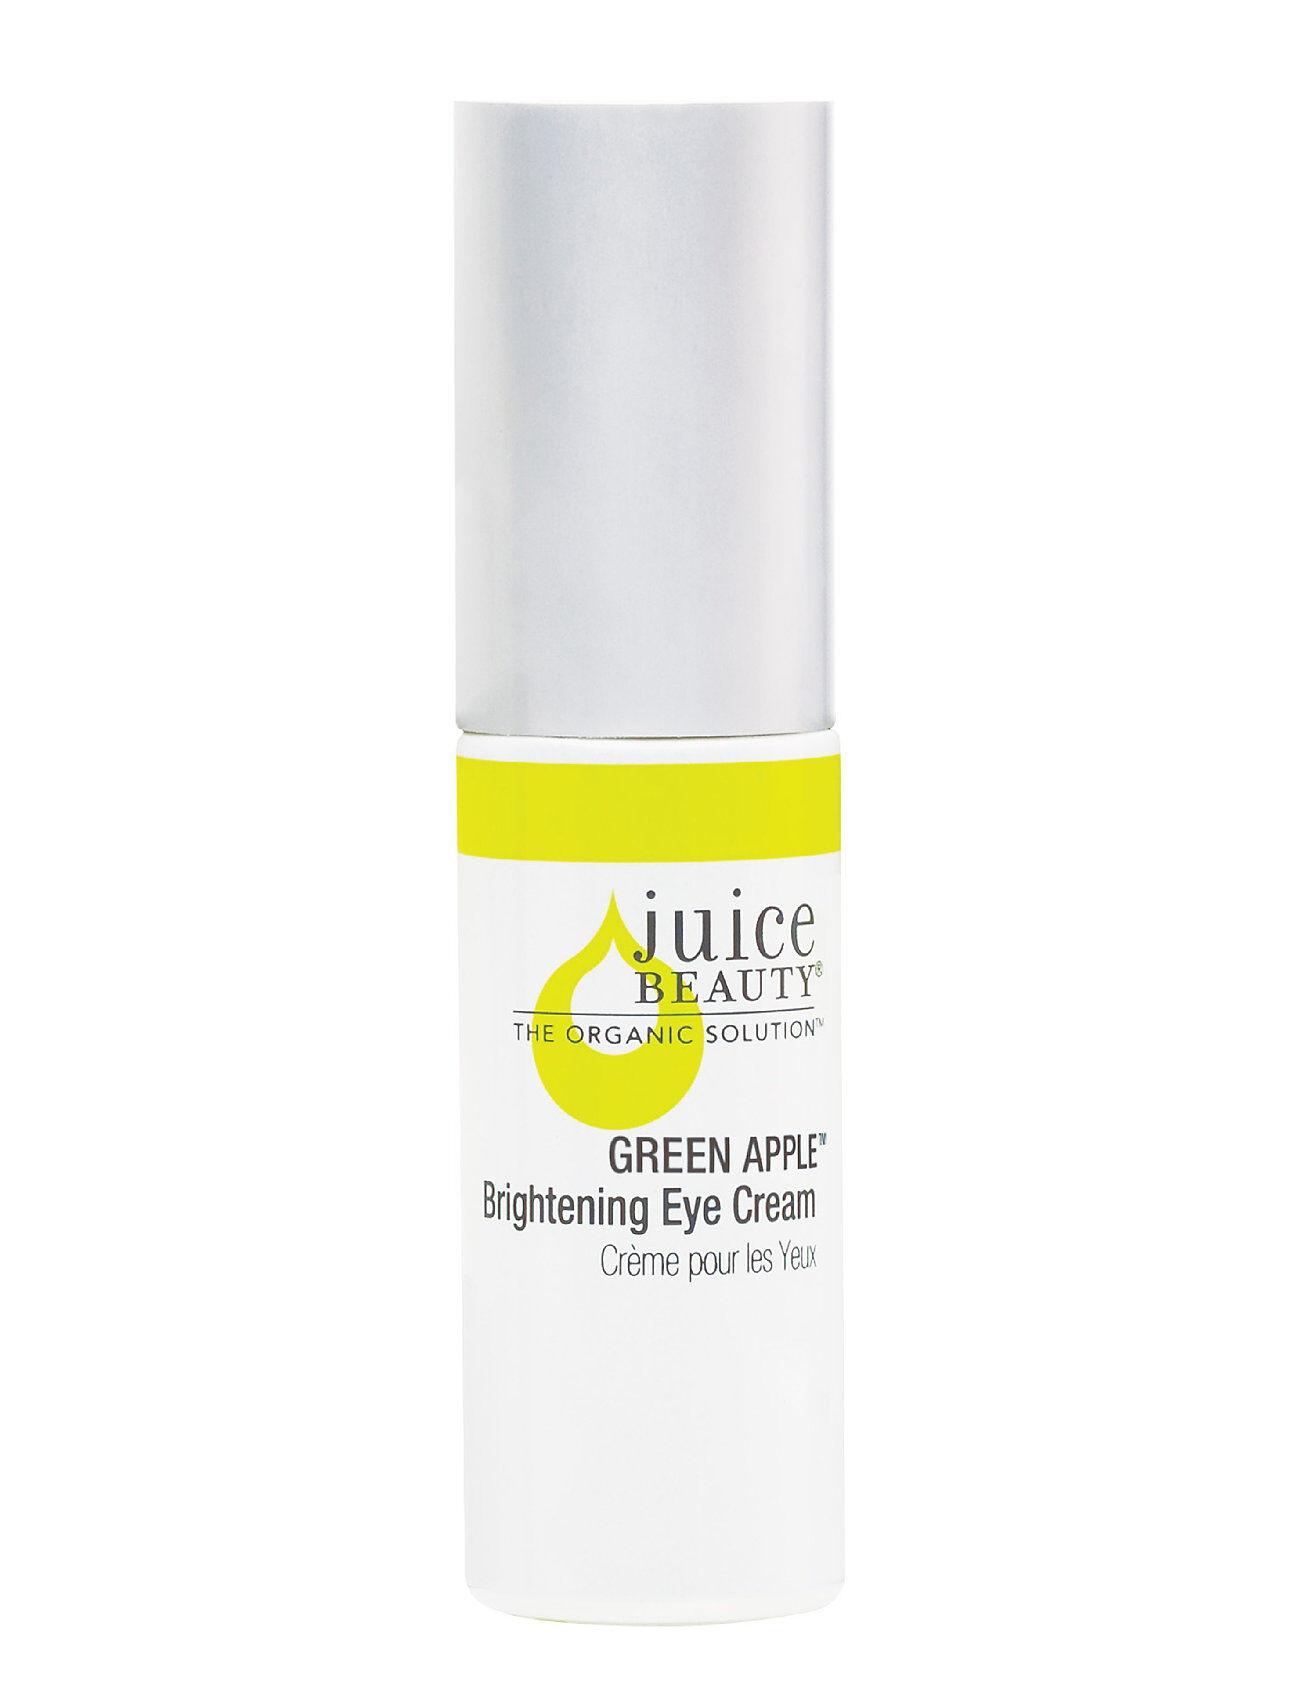 Juice Beauty Green Apple™ Brightening Eye Cream